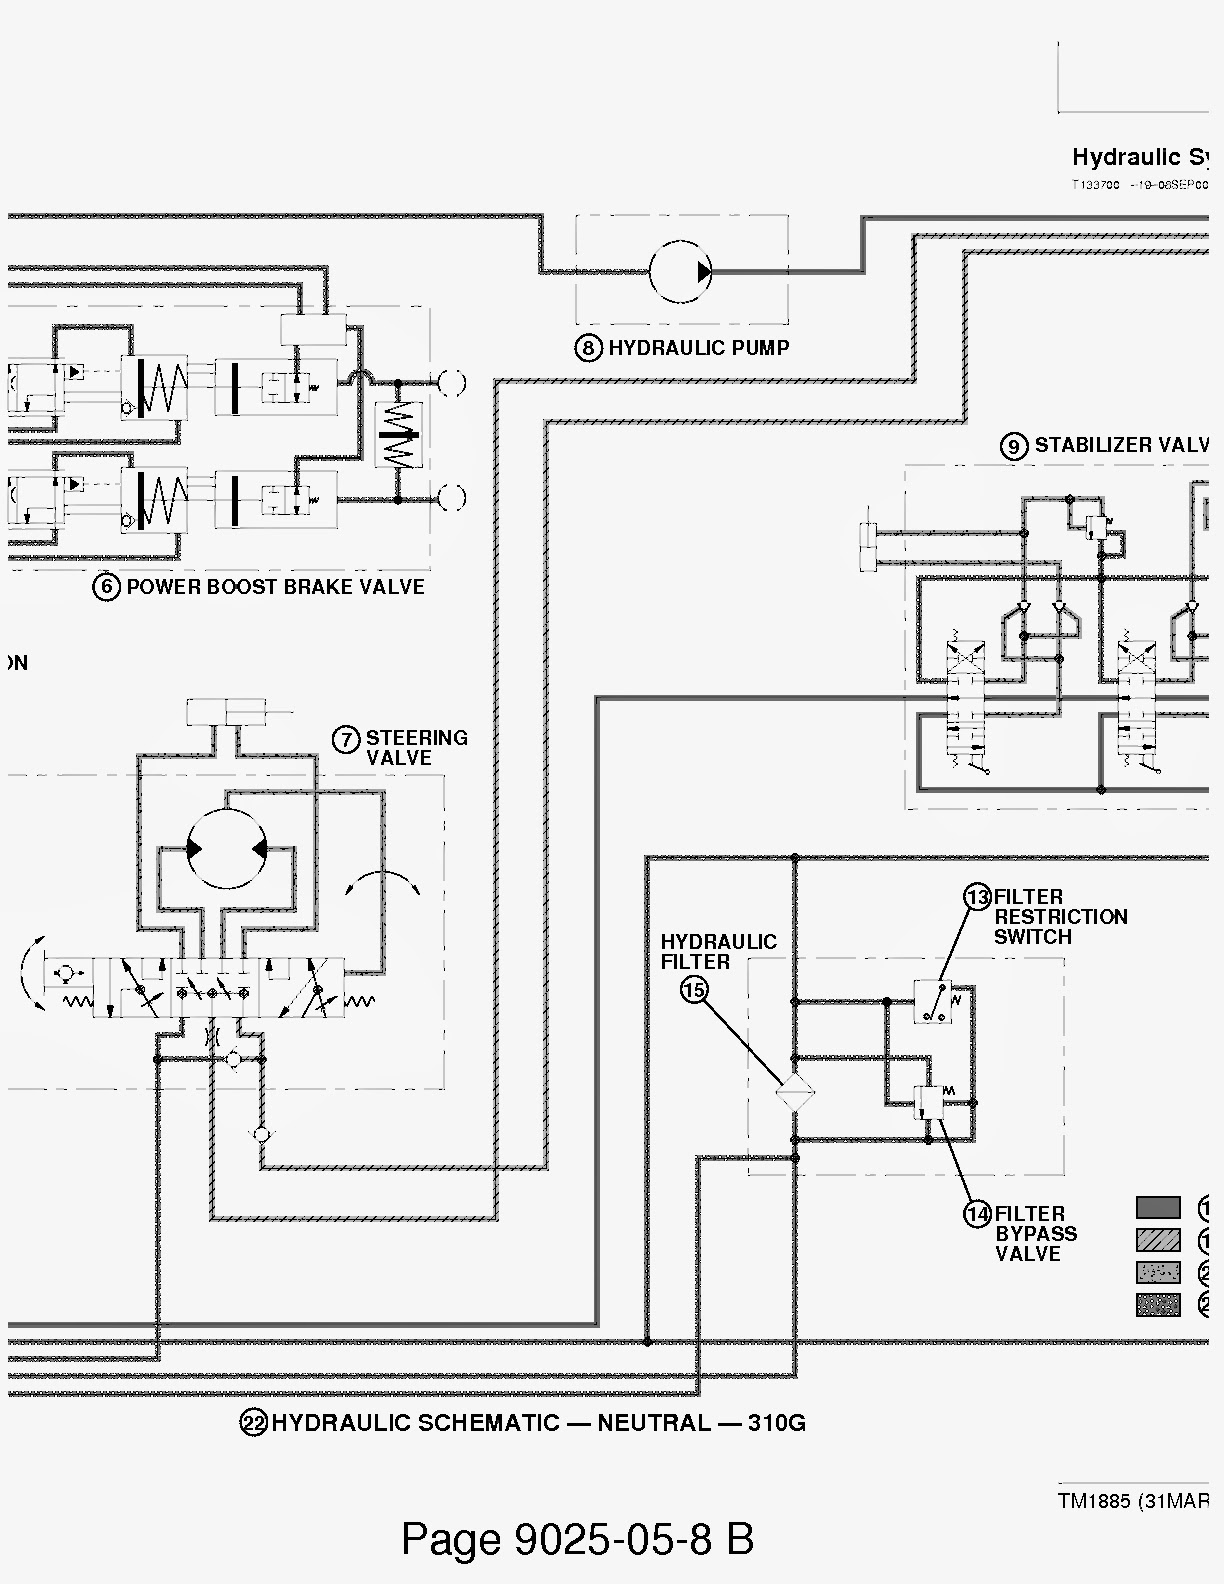 wrg 9829 310g john deere wiring diagram310g john deere wiring diagram [ 1224 x 1584 Pixel ]